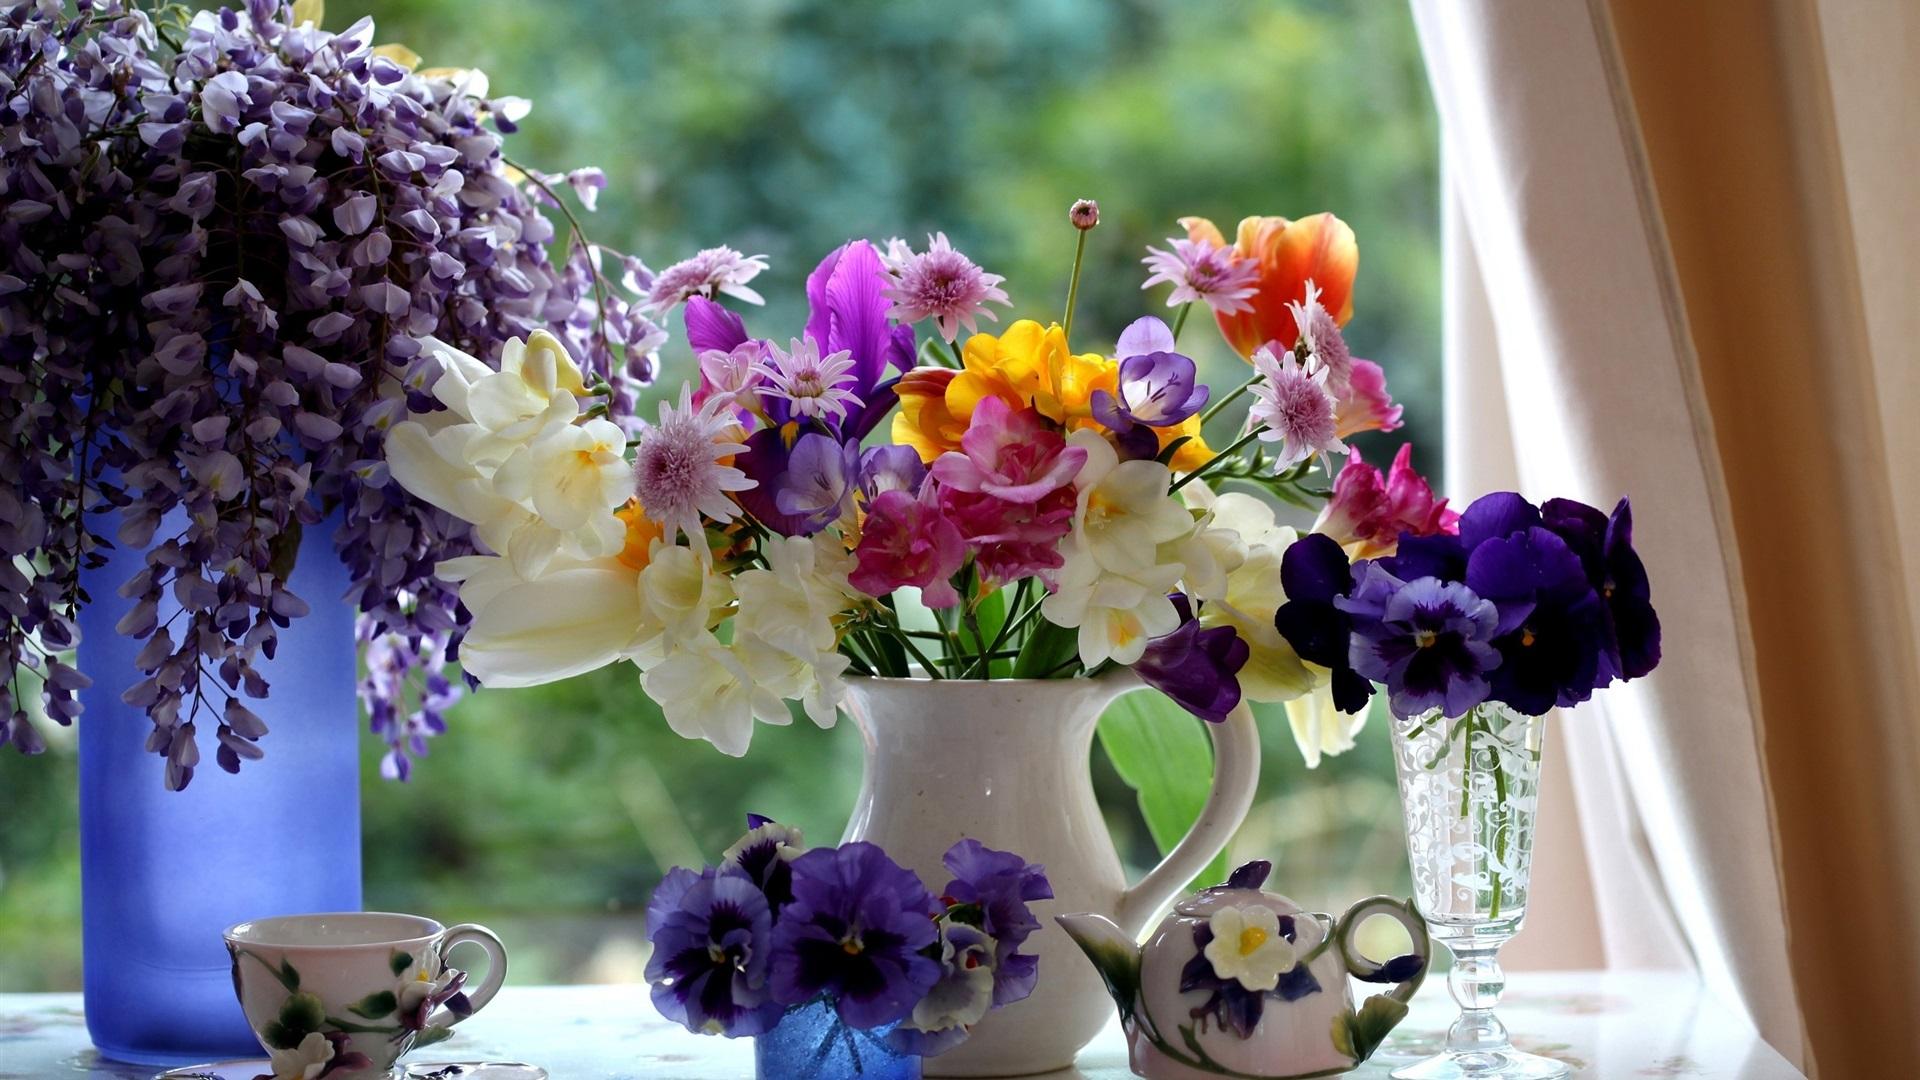 vase wallpaper 7391 1920 - photo #25